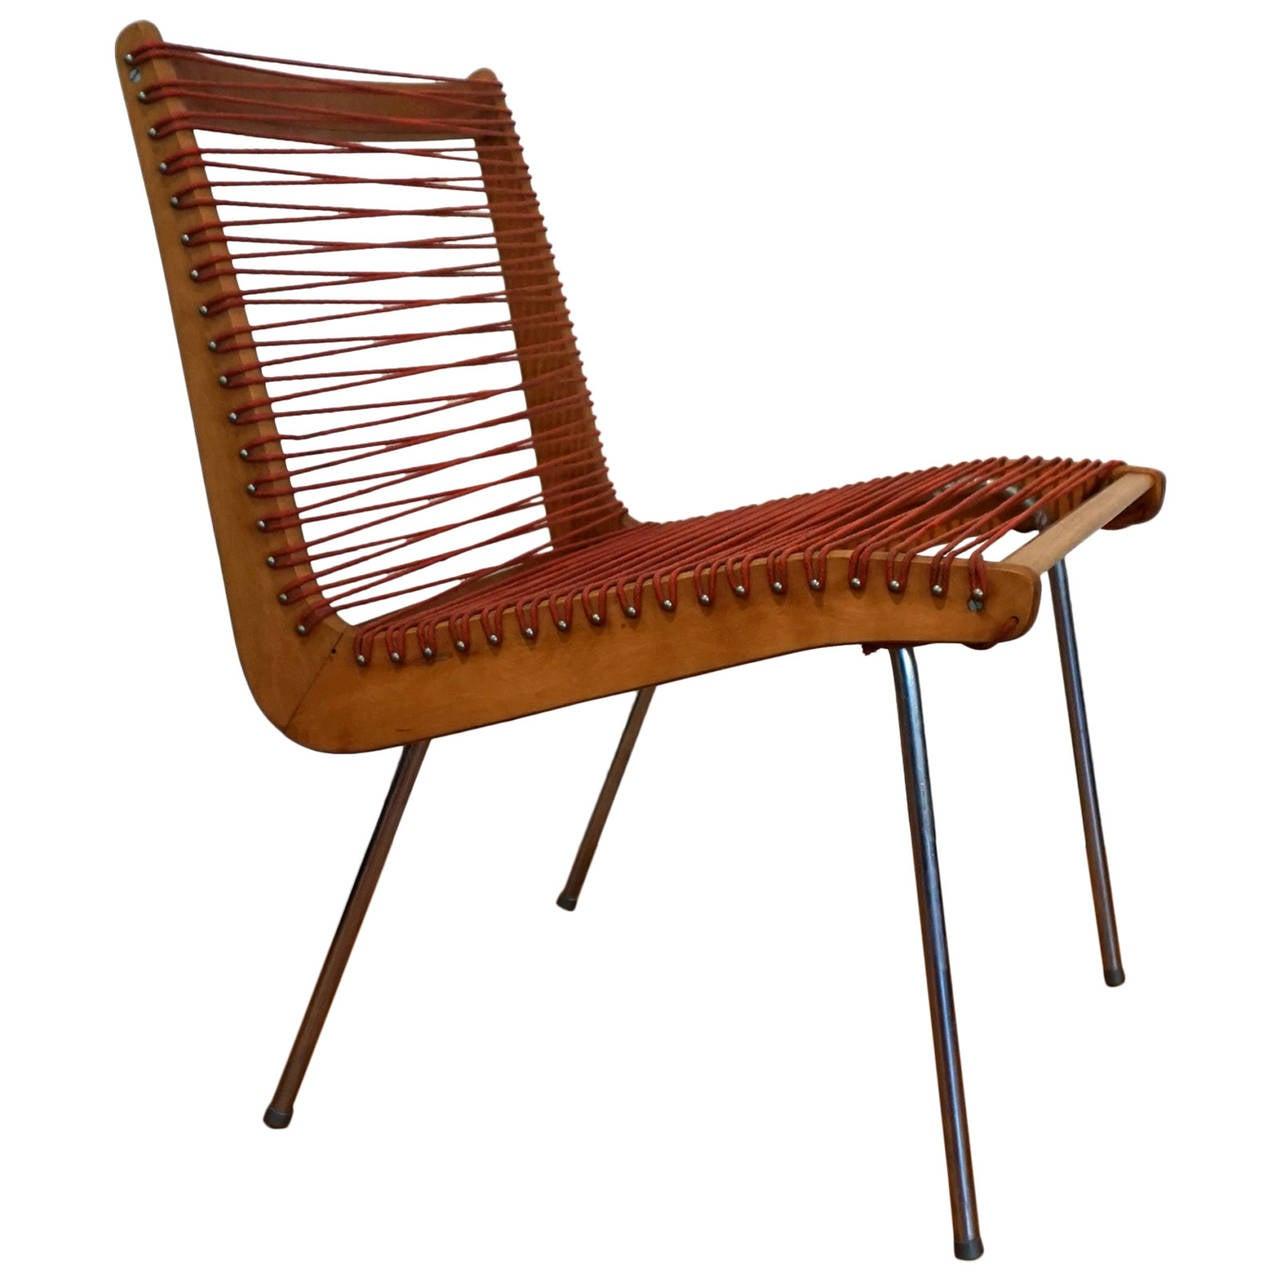 1950 MoMA Good Design String Chair By Robert J Ellenberger For CALFAB 1